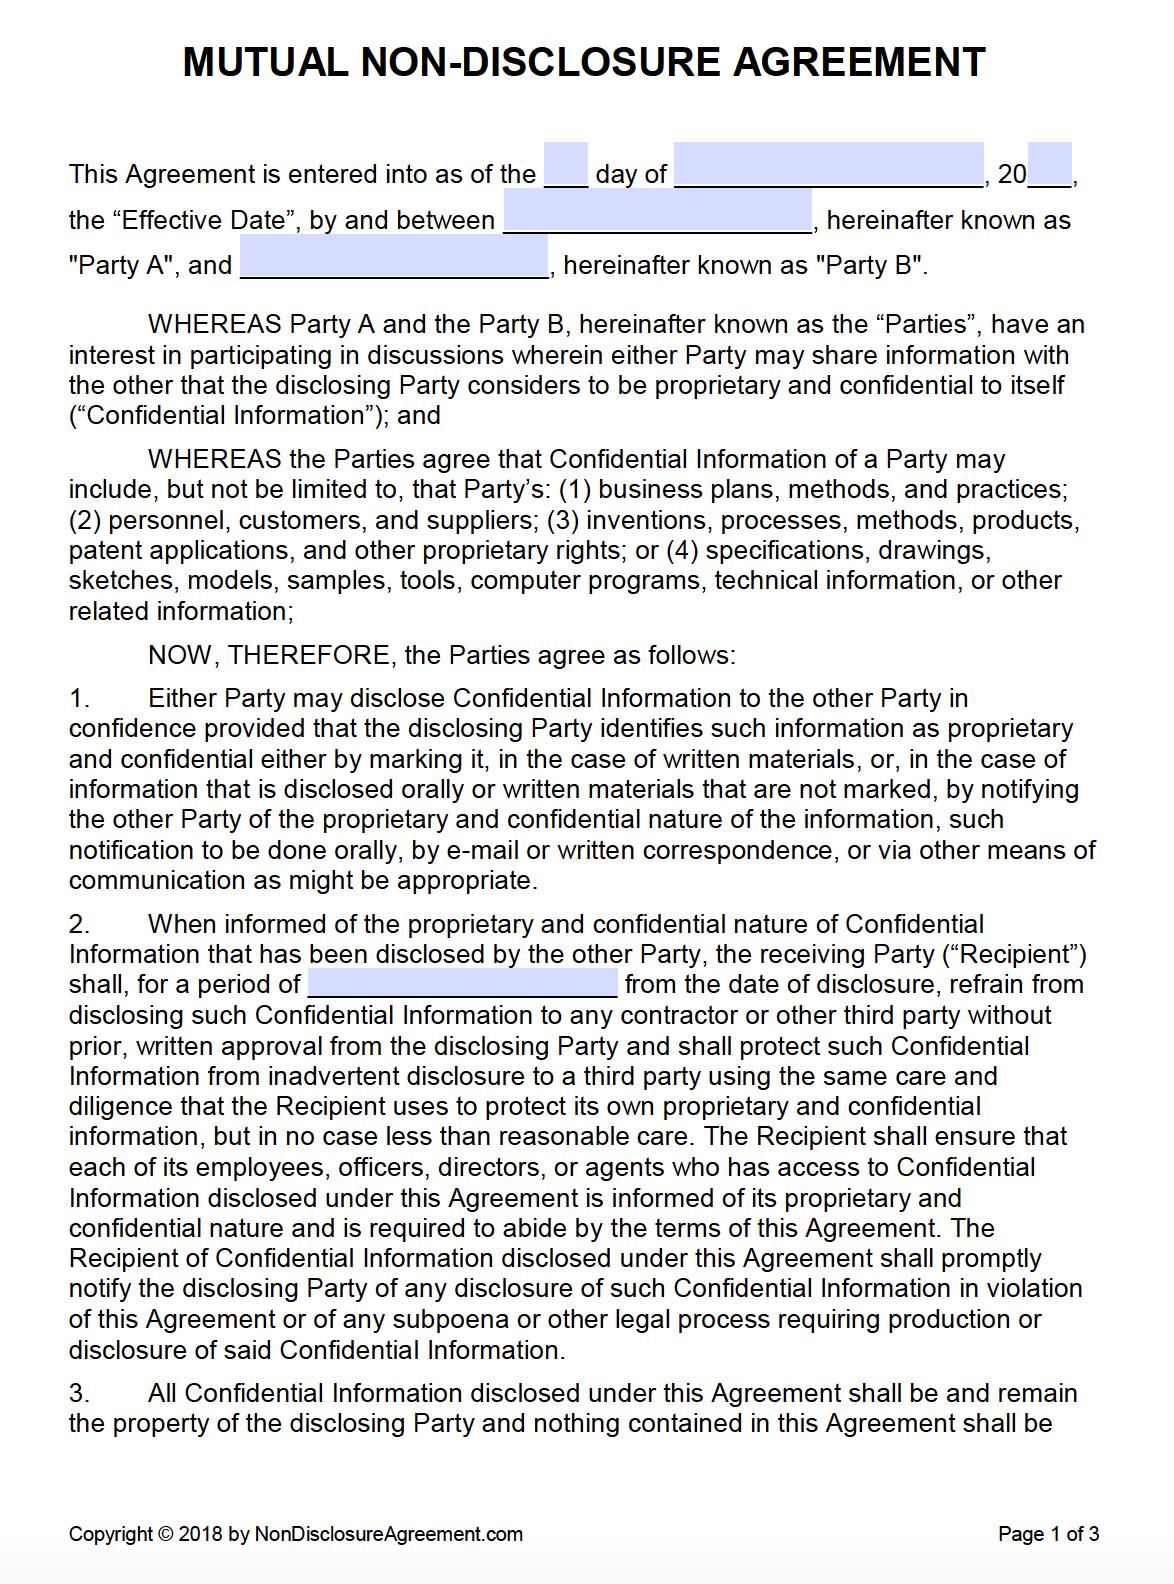 Free Mutual Non-Disclosure Agreement (Nda) | Pdf | Word (.docx) - Free Printable Non Disclosure Agreement Form